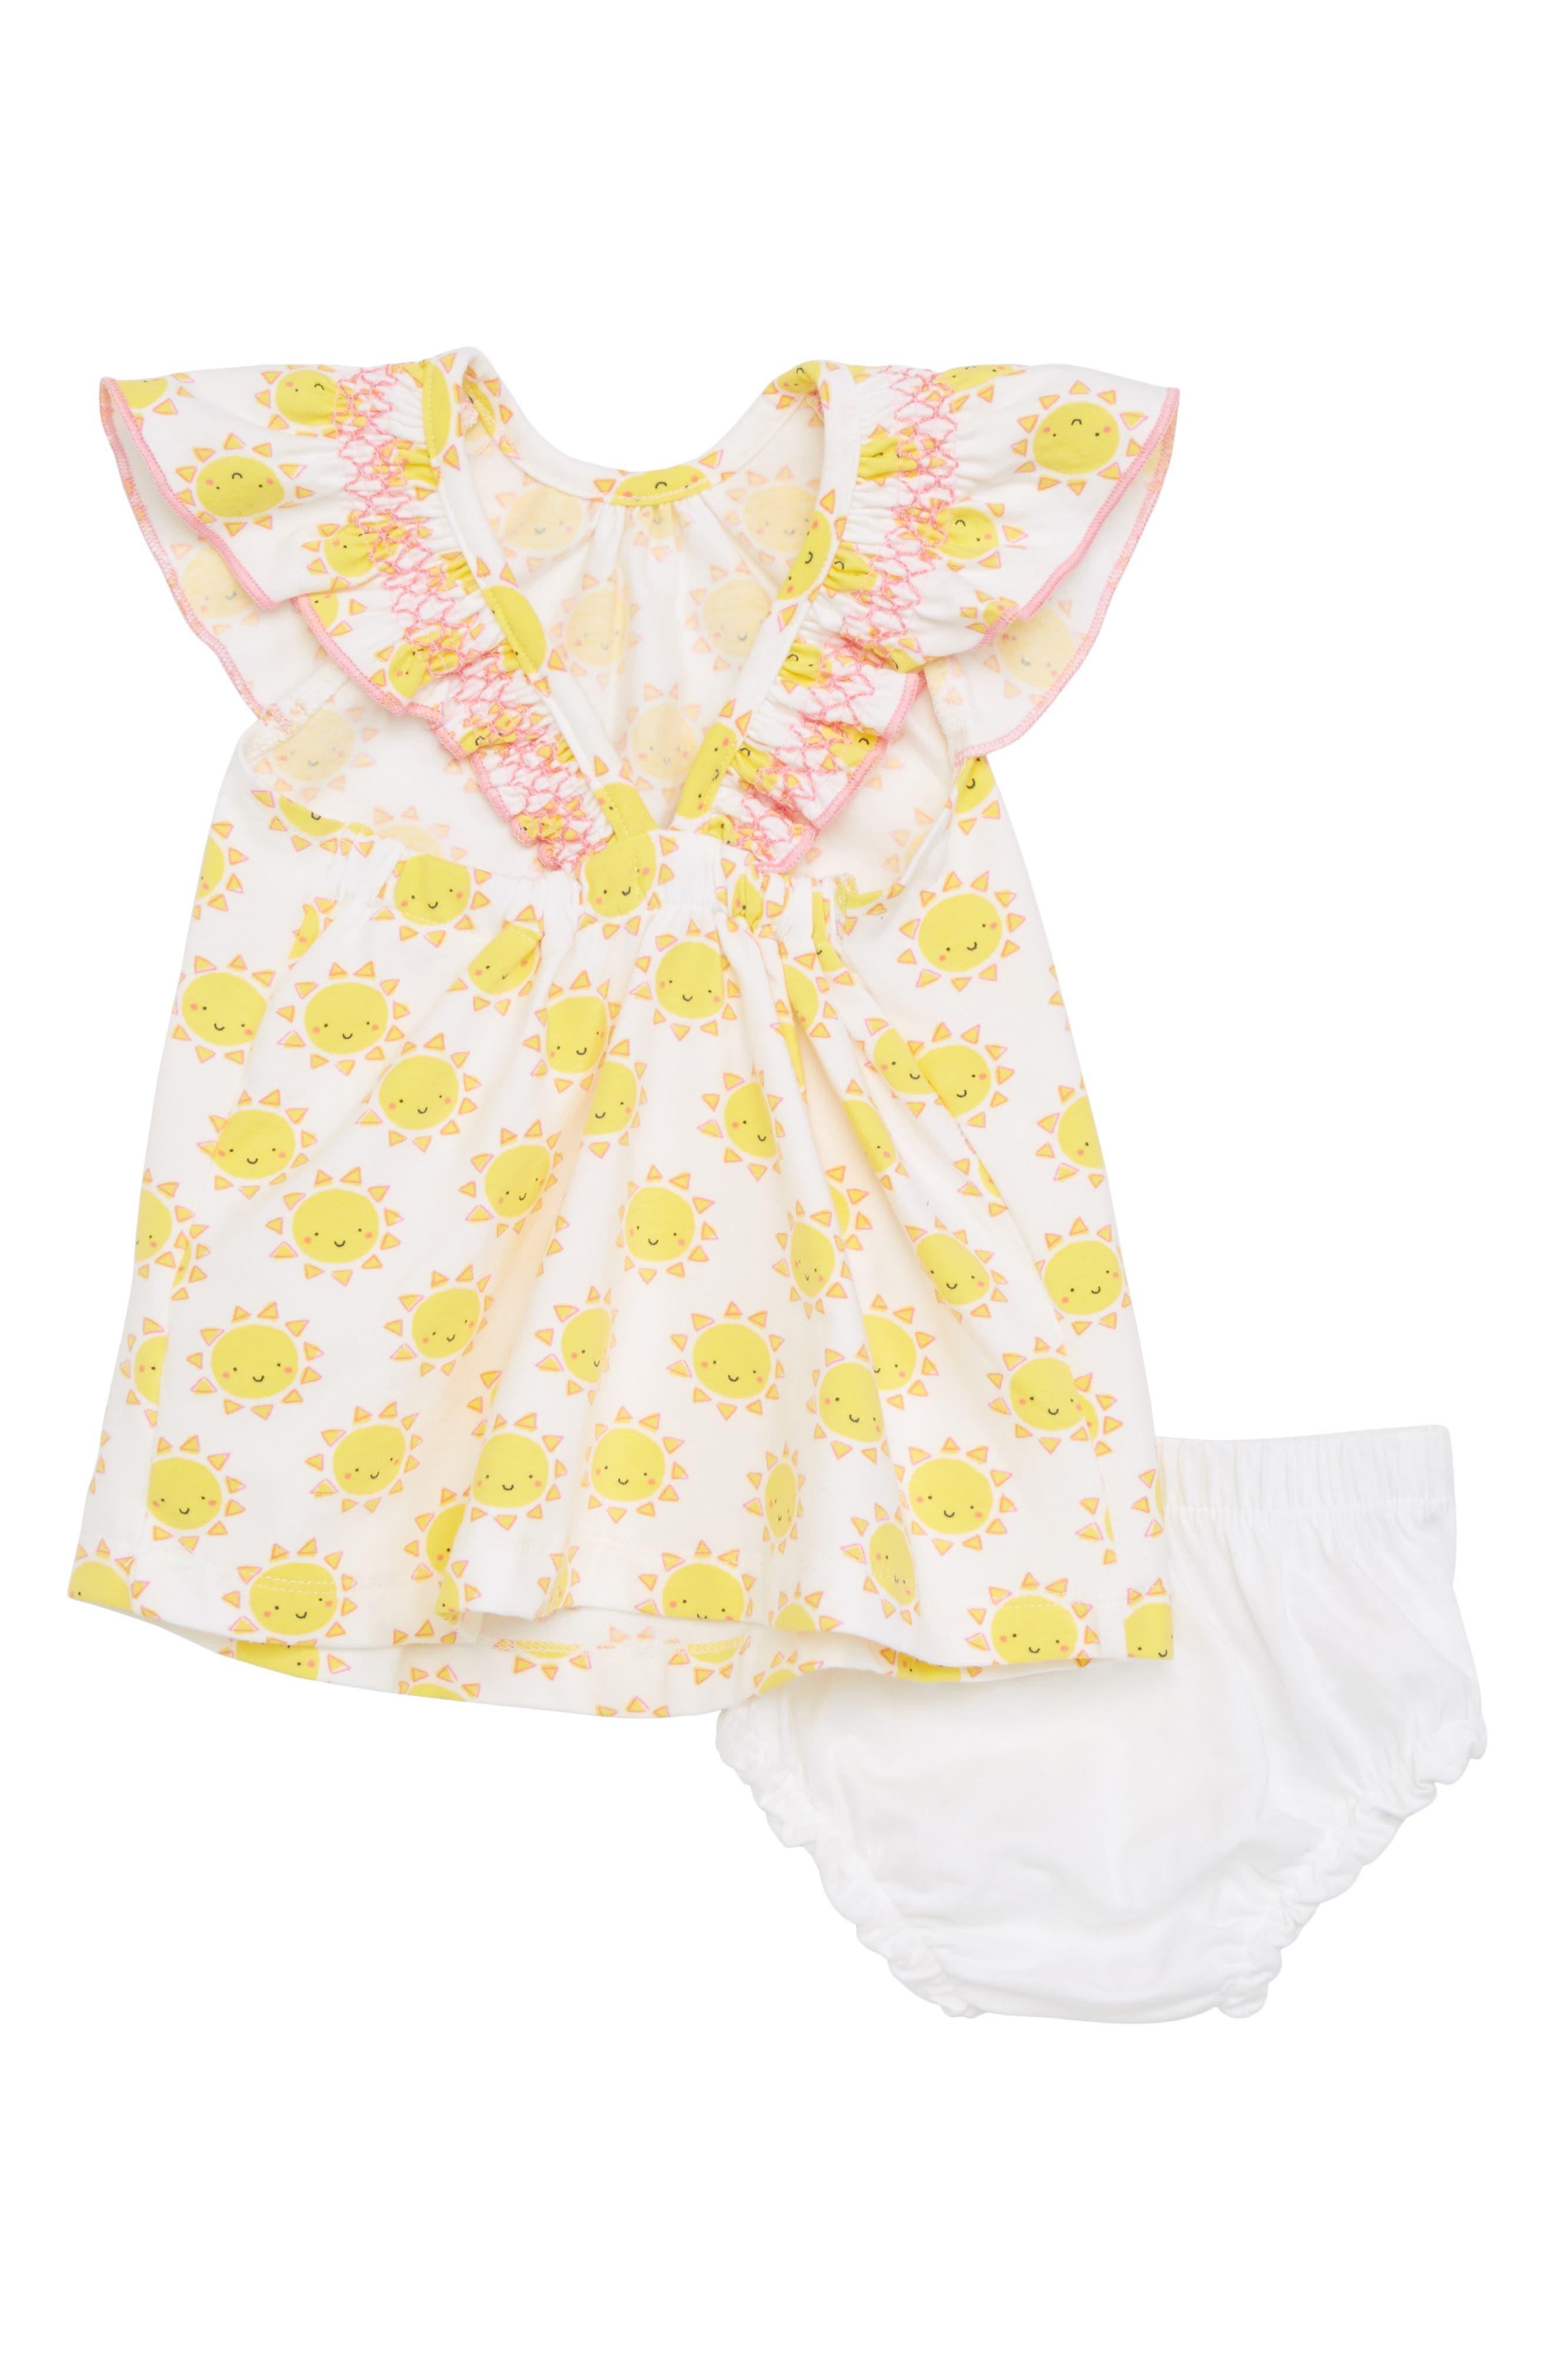 Merry Sunshine Dress,                             Alternate thumbnail 3, color,                             Merry Sunshine